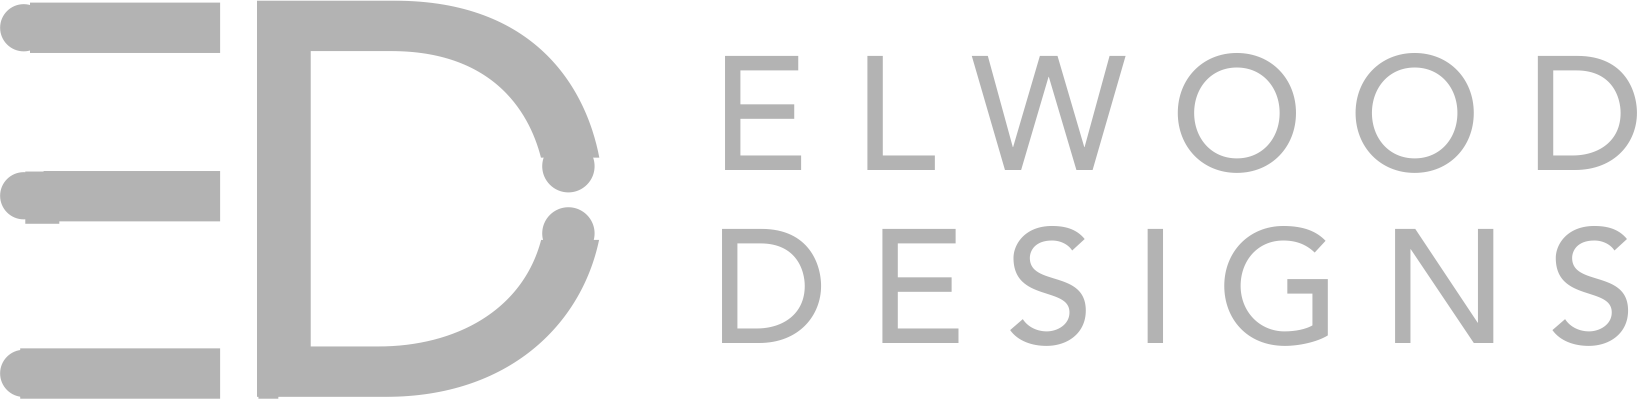 ELWOOD DESIGNS